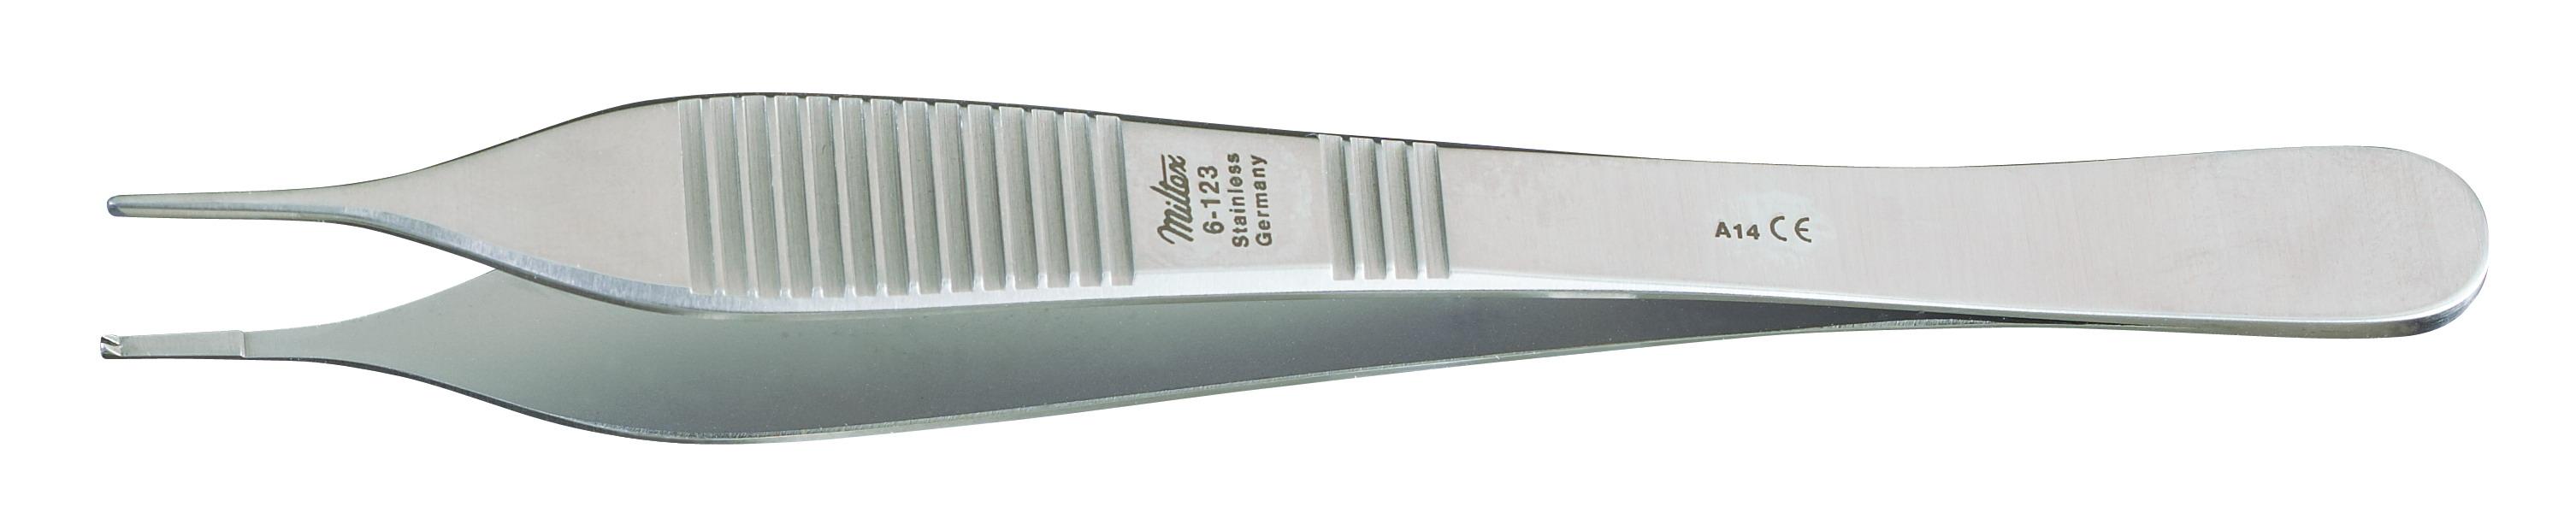 adson-suture-4-3-4-w-plat-6-123-miltex.jpg